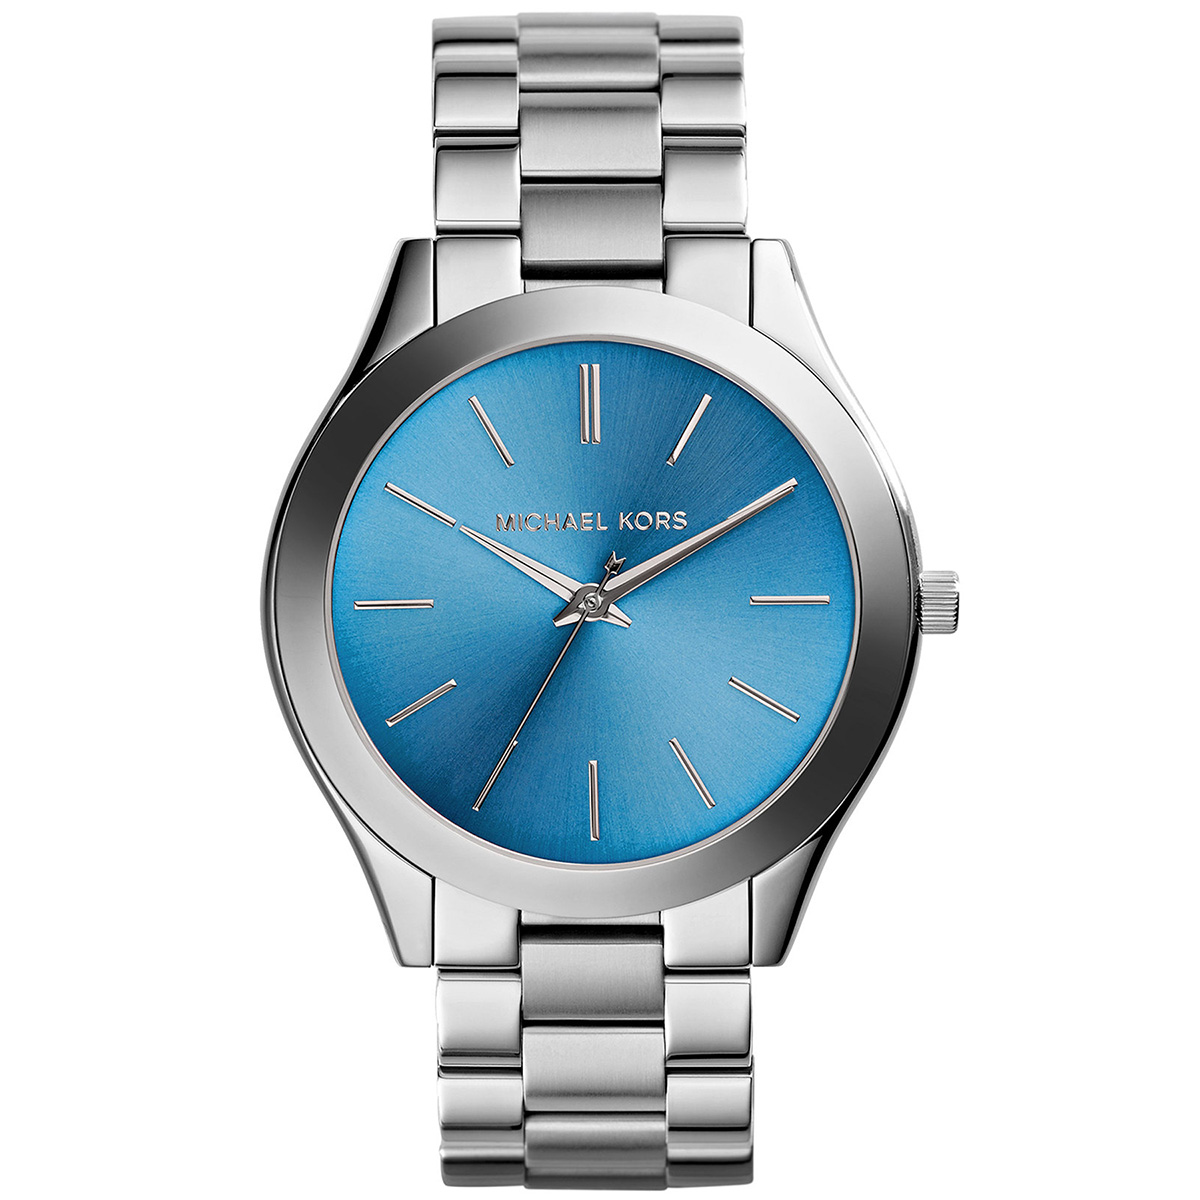 Michael kors damenuhren silber  Michael Kors Uhr MK3292 Runway Damenuhr Silber Blau Edelstahl Slim ...